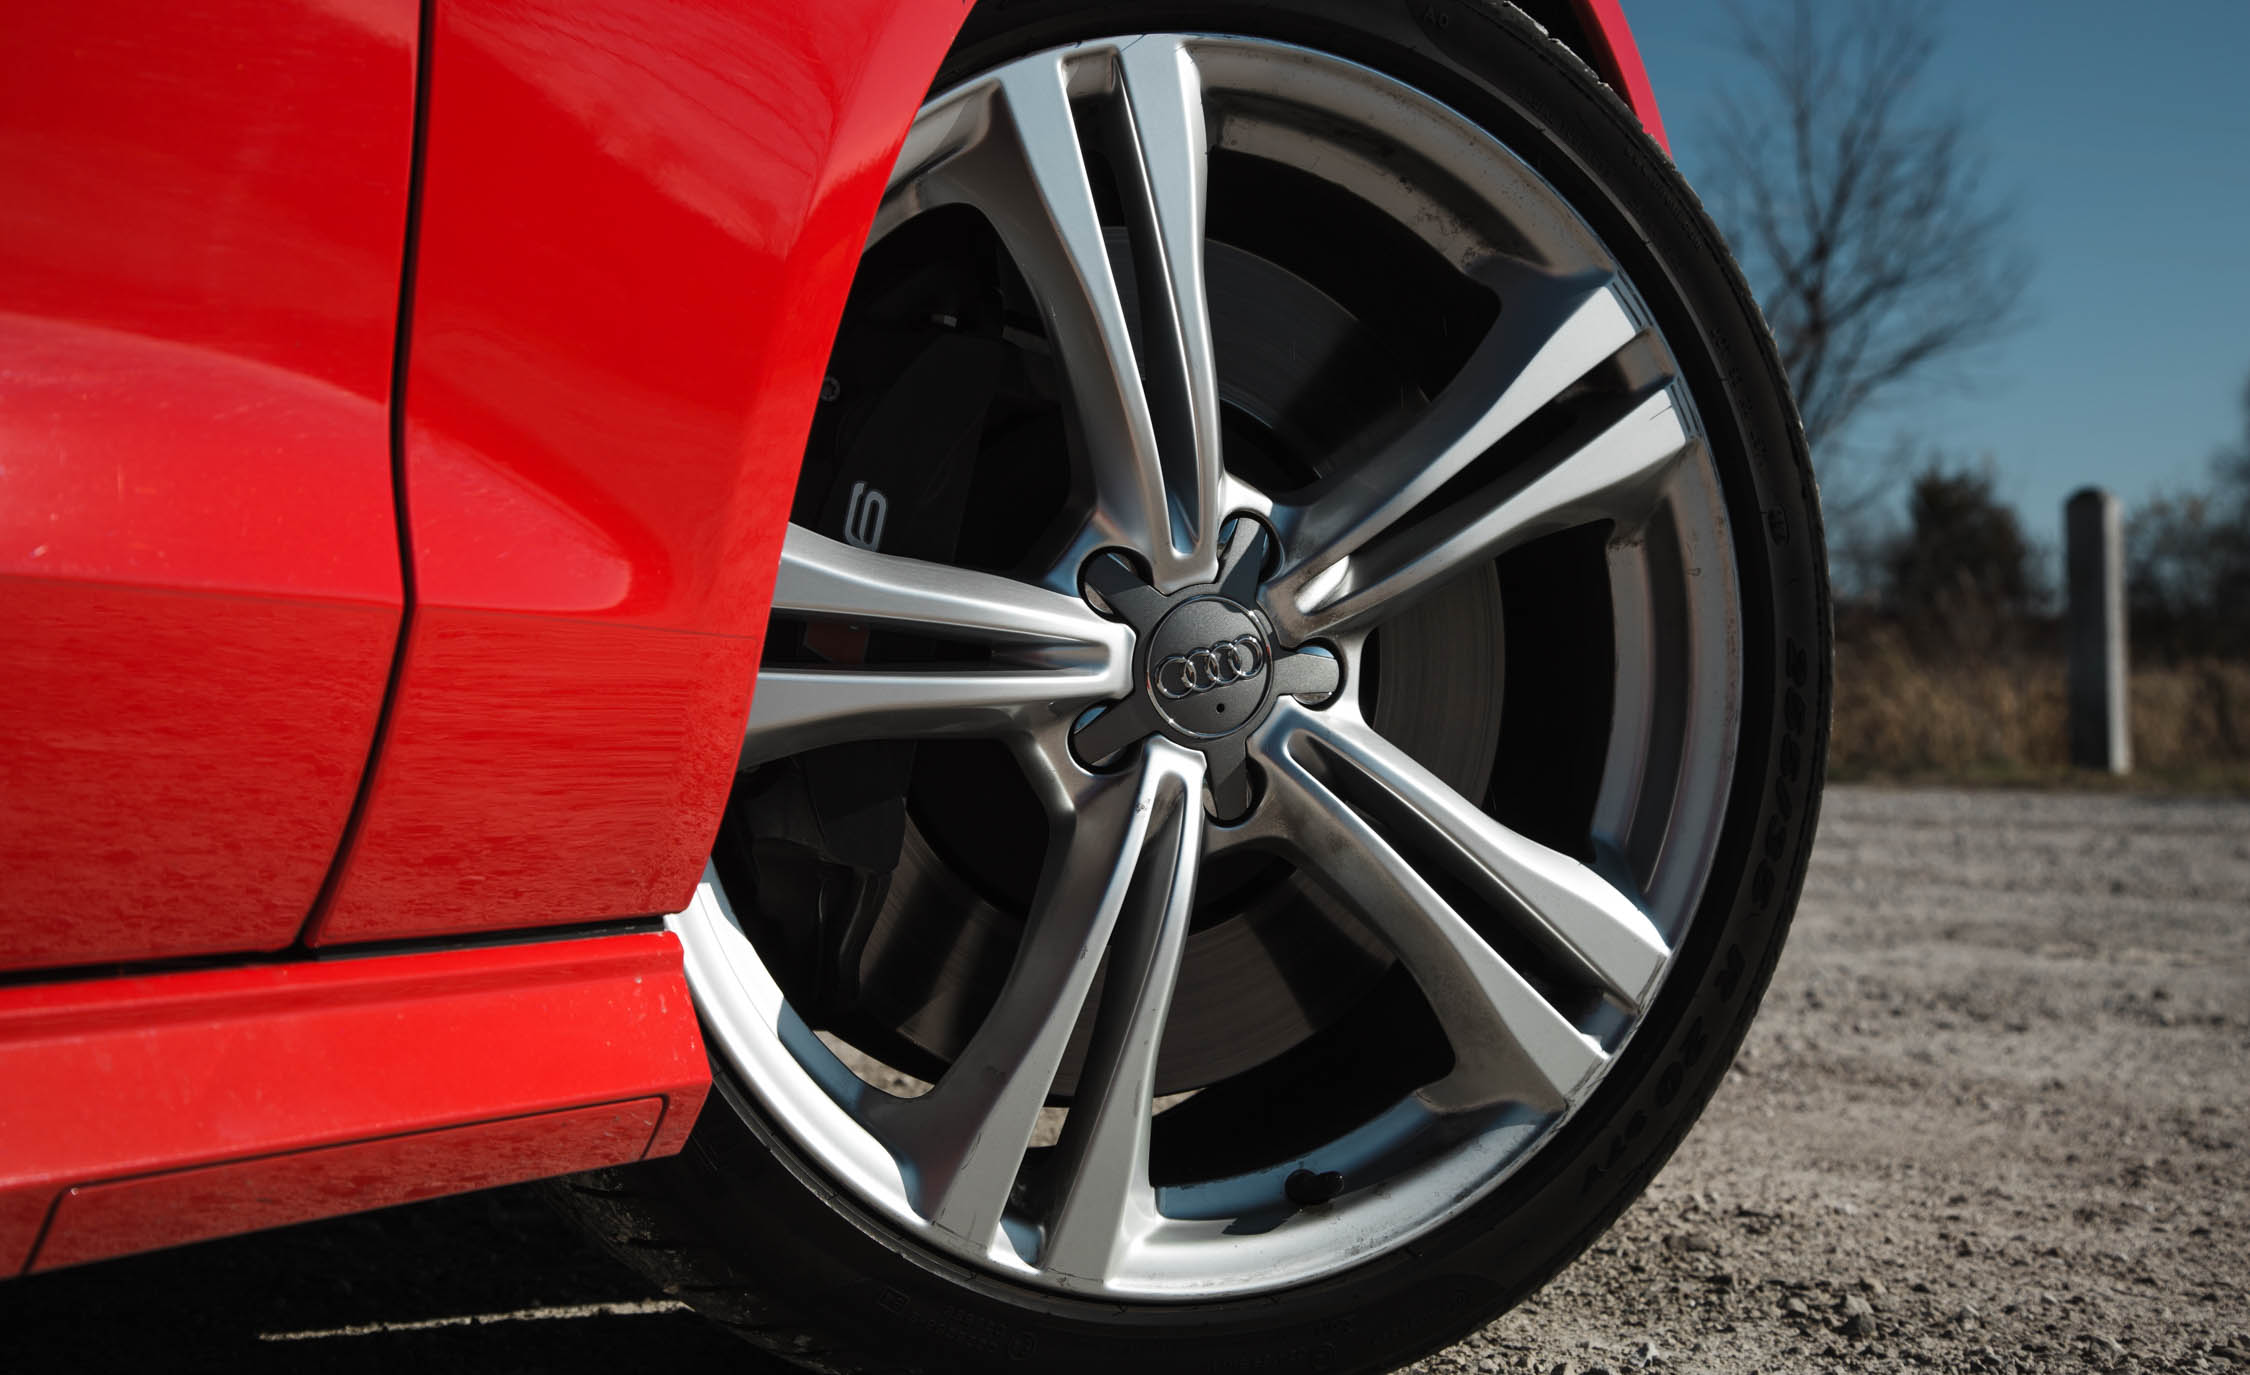 2016 Audi S6 Exterior Wheel